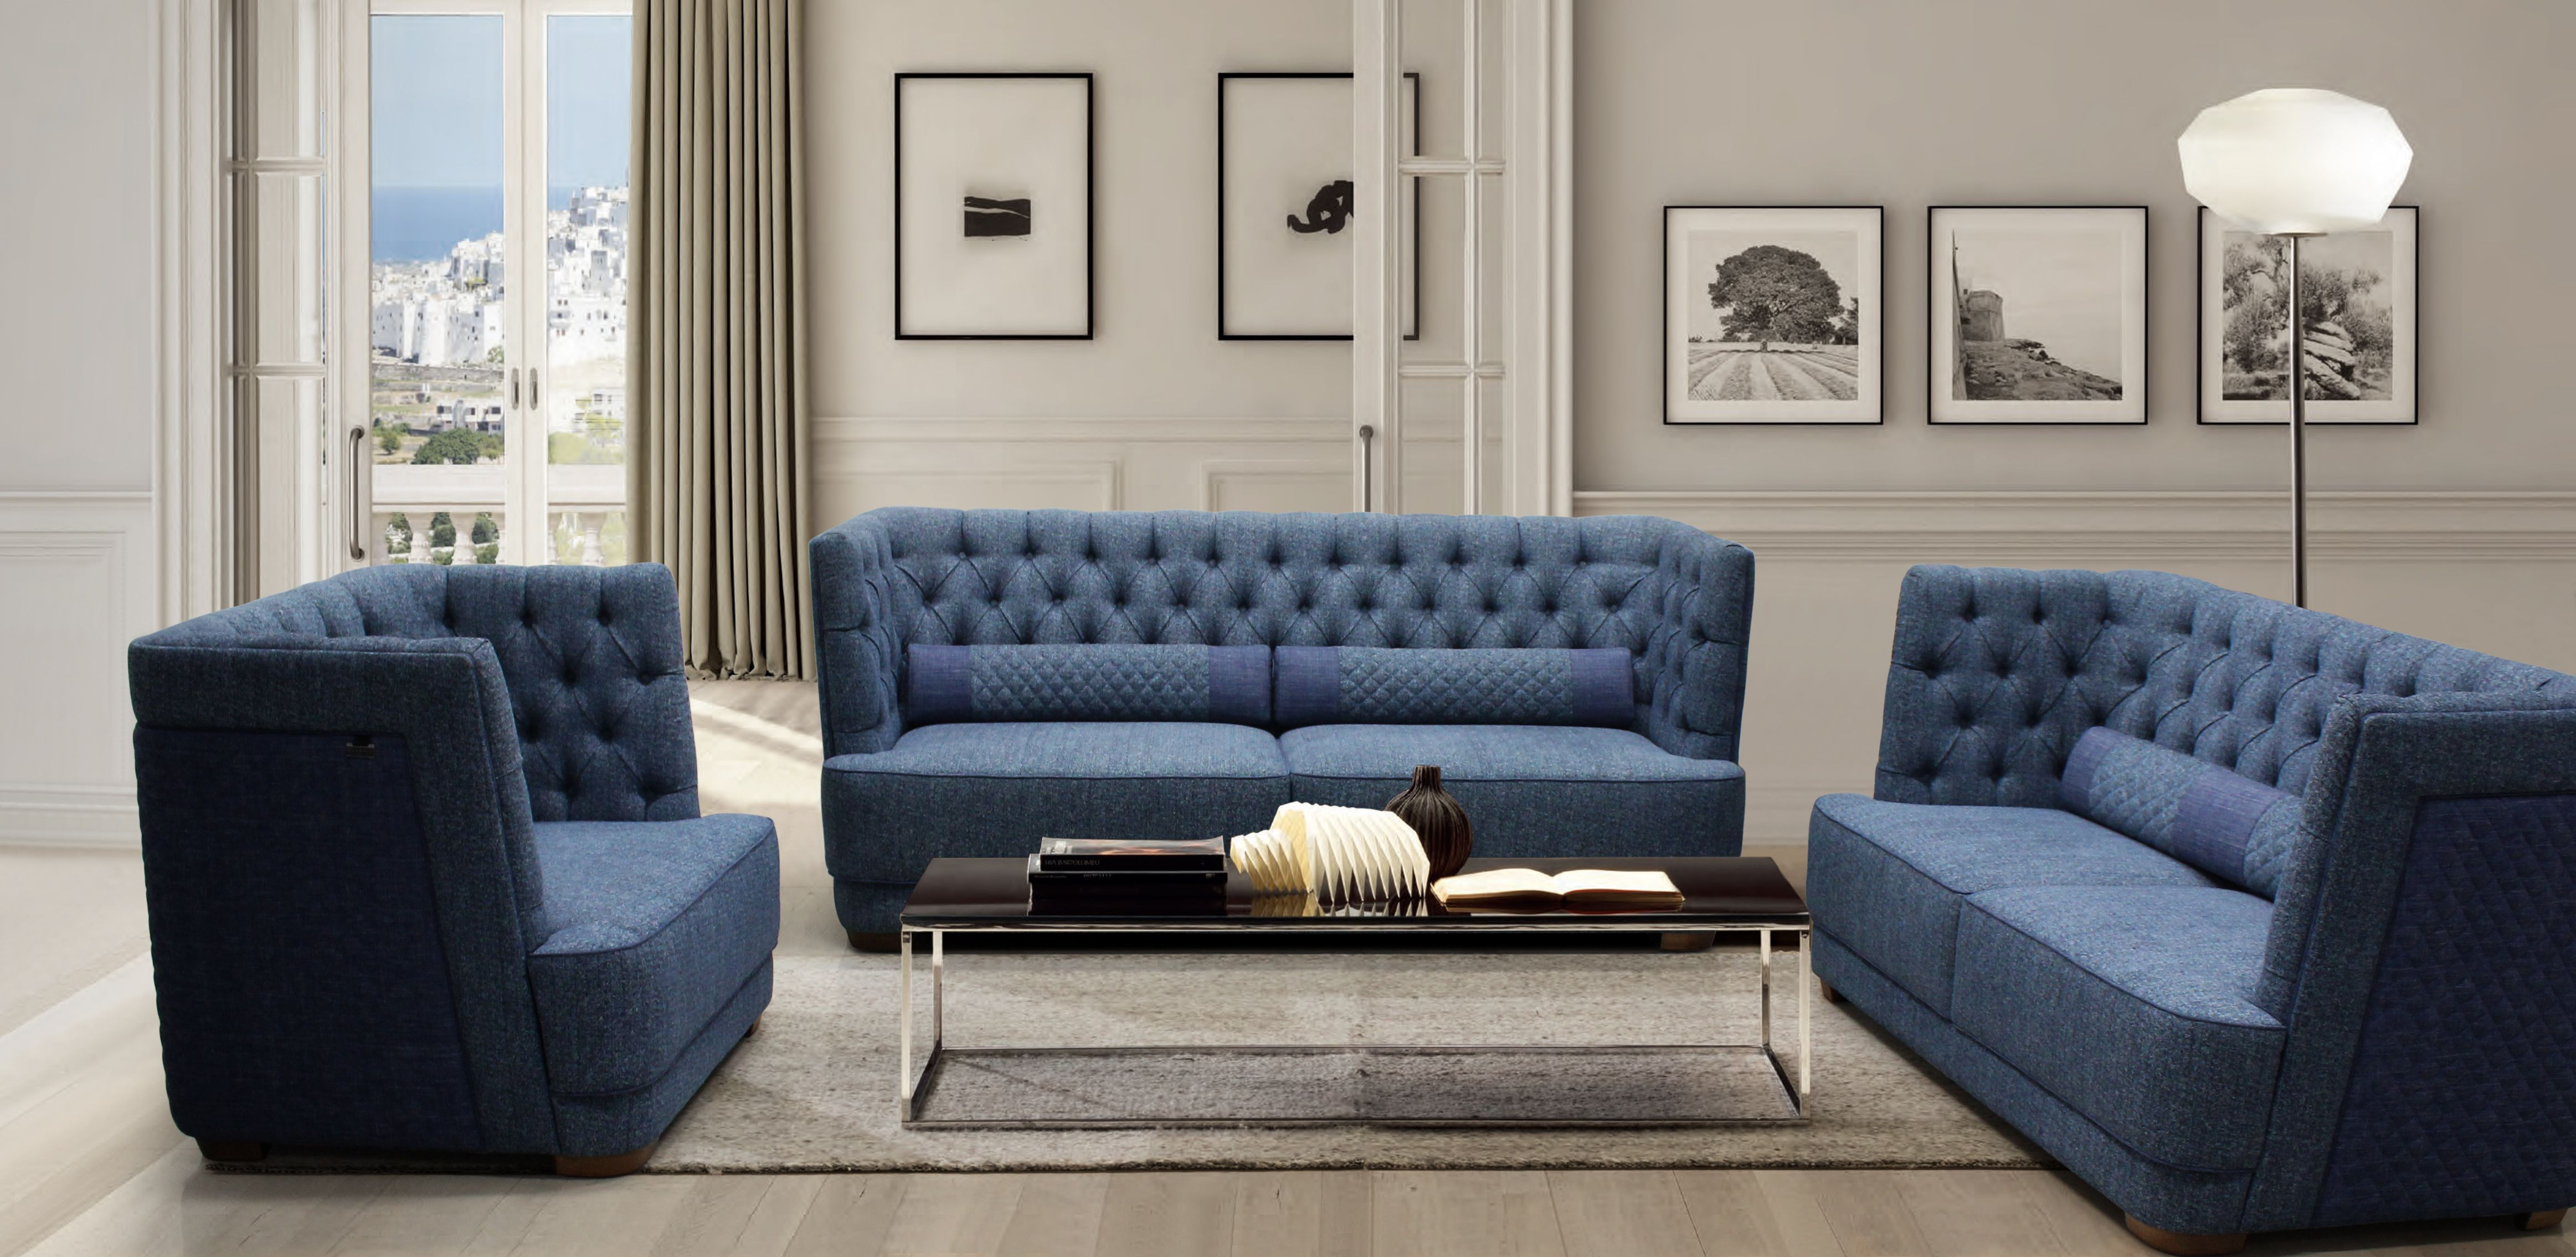 Dynamic Chesterfield Modern 123 Seater Fabric Sofa Sofa Sofa Furniture Fabric Sofa